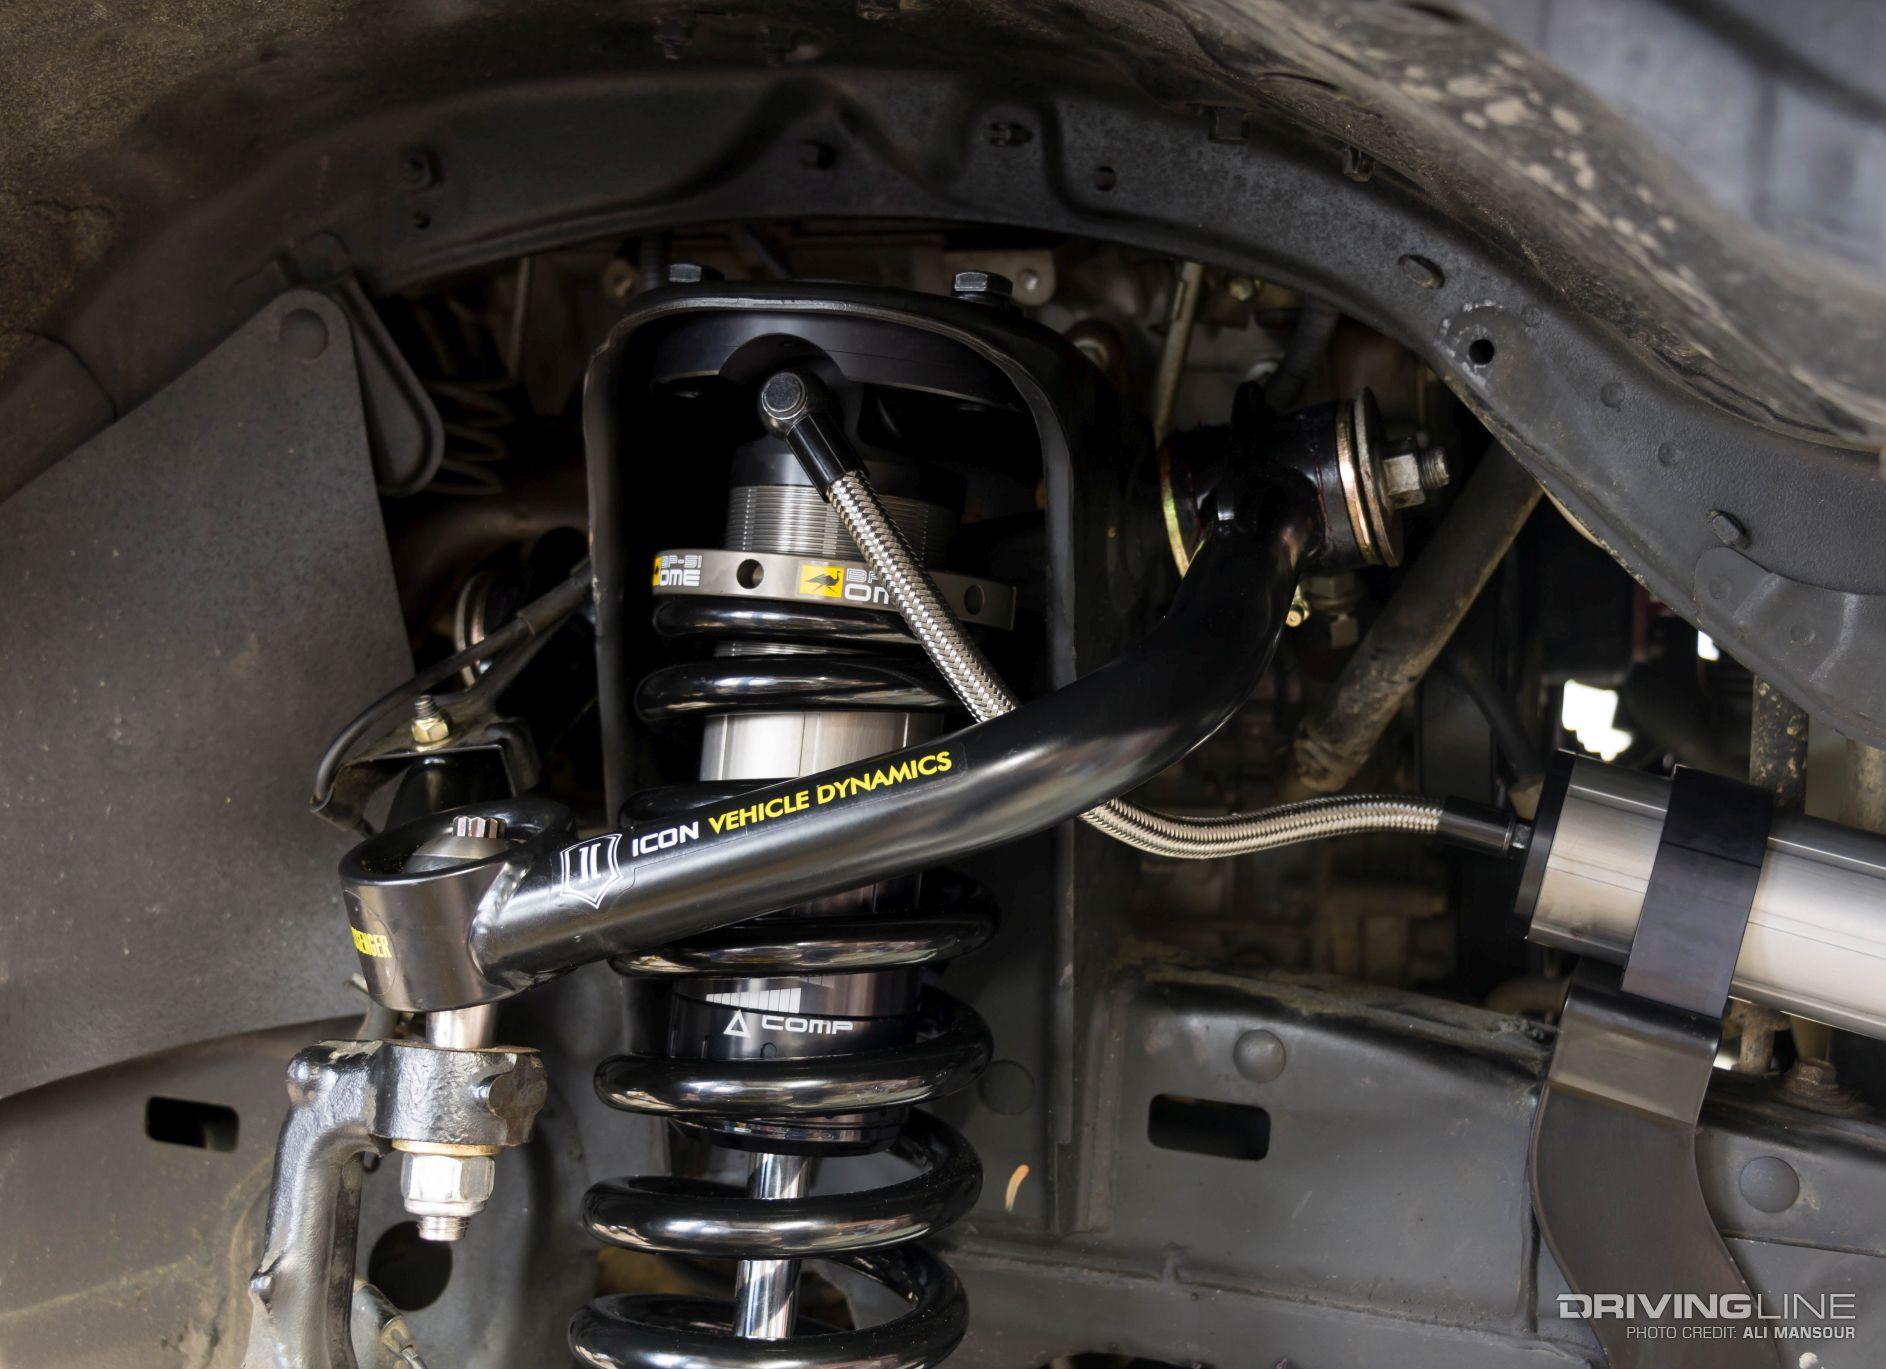 2008 Toyota Tacoma ICON Vechicle Dynamics Uniball Upper ...